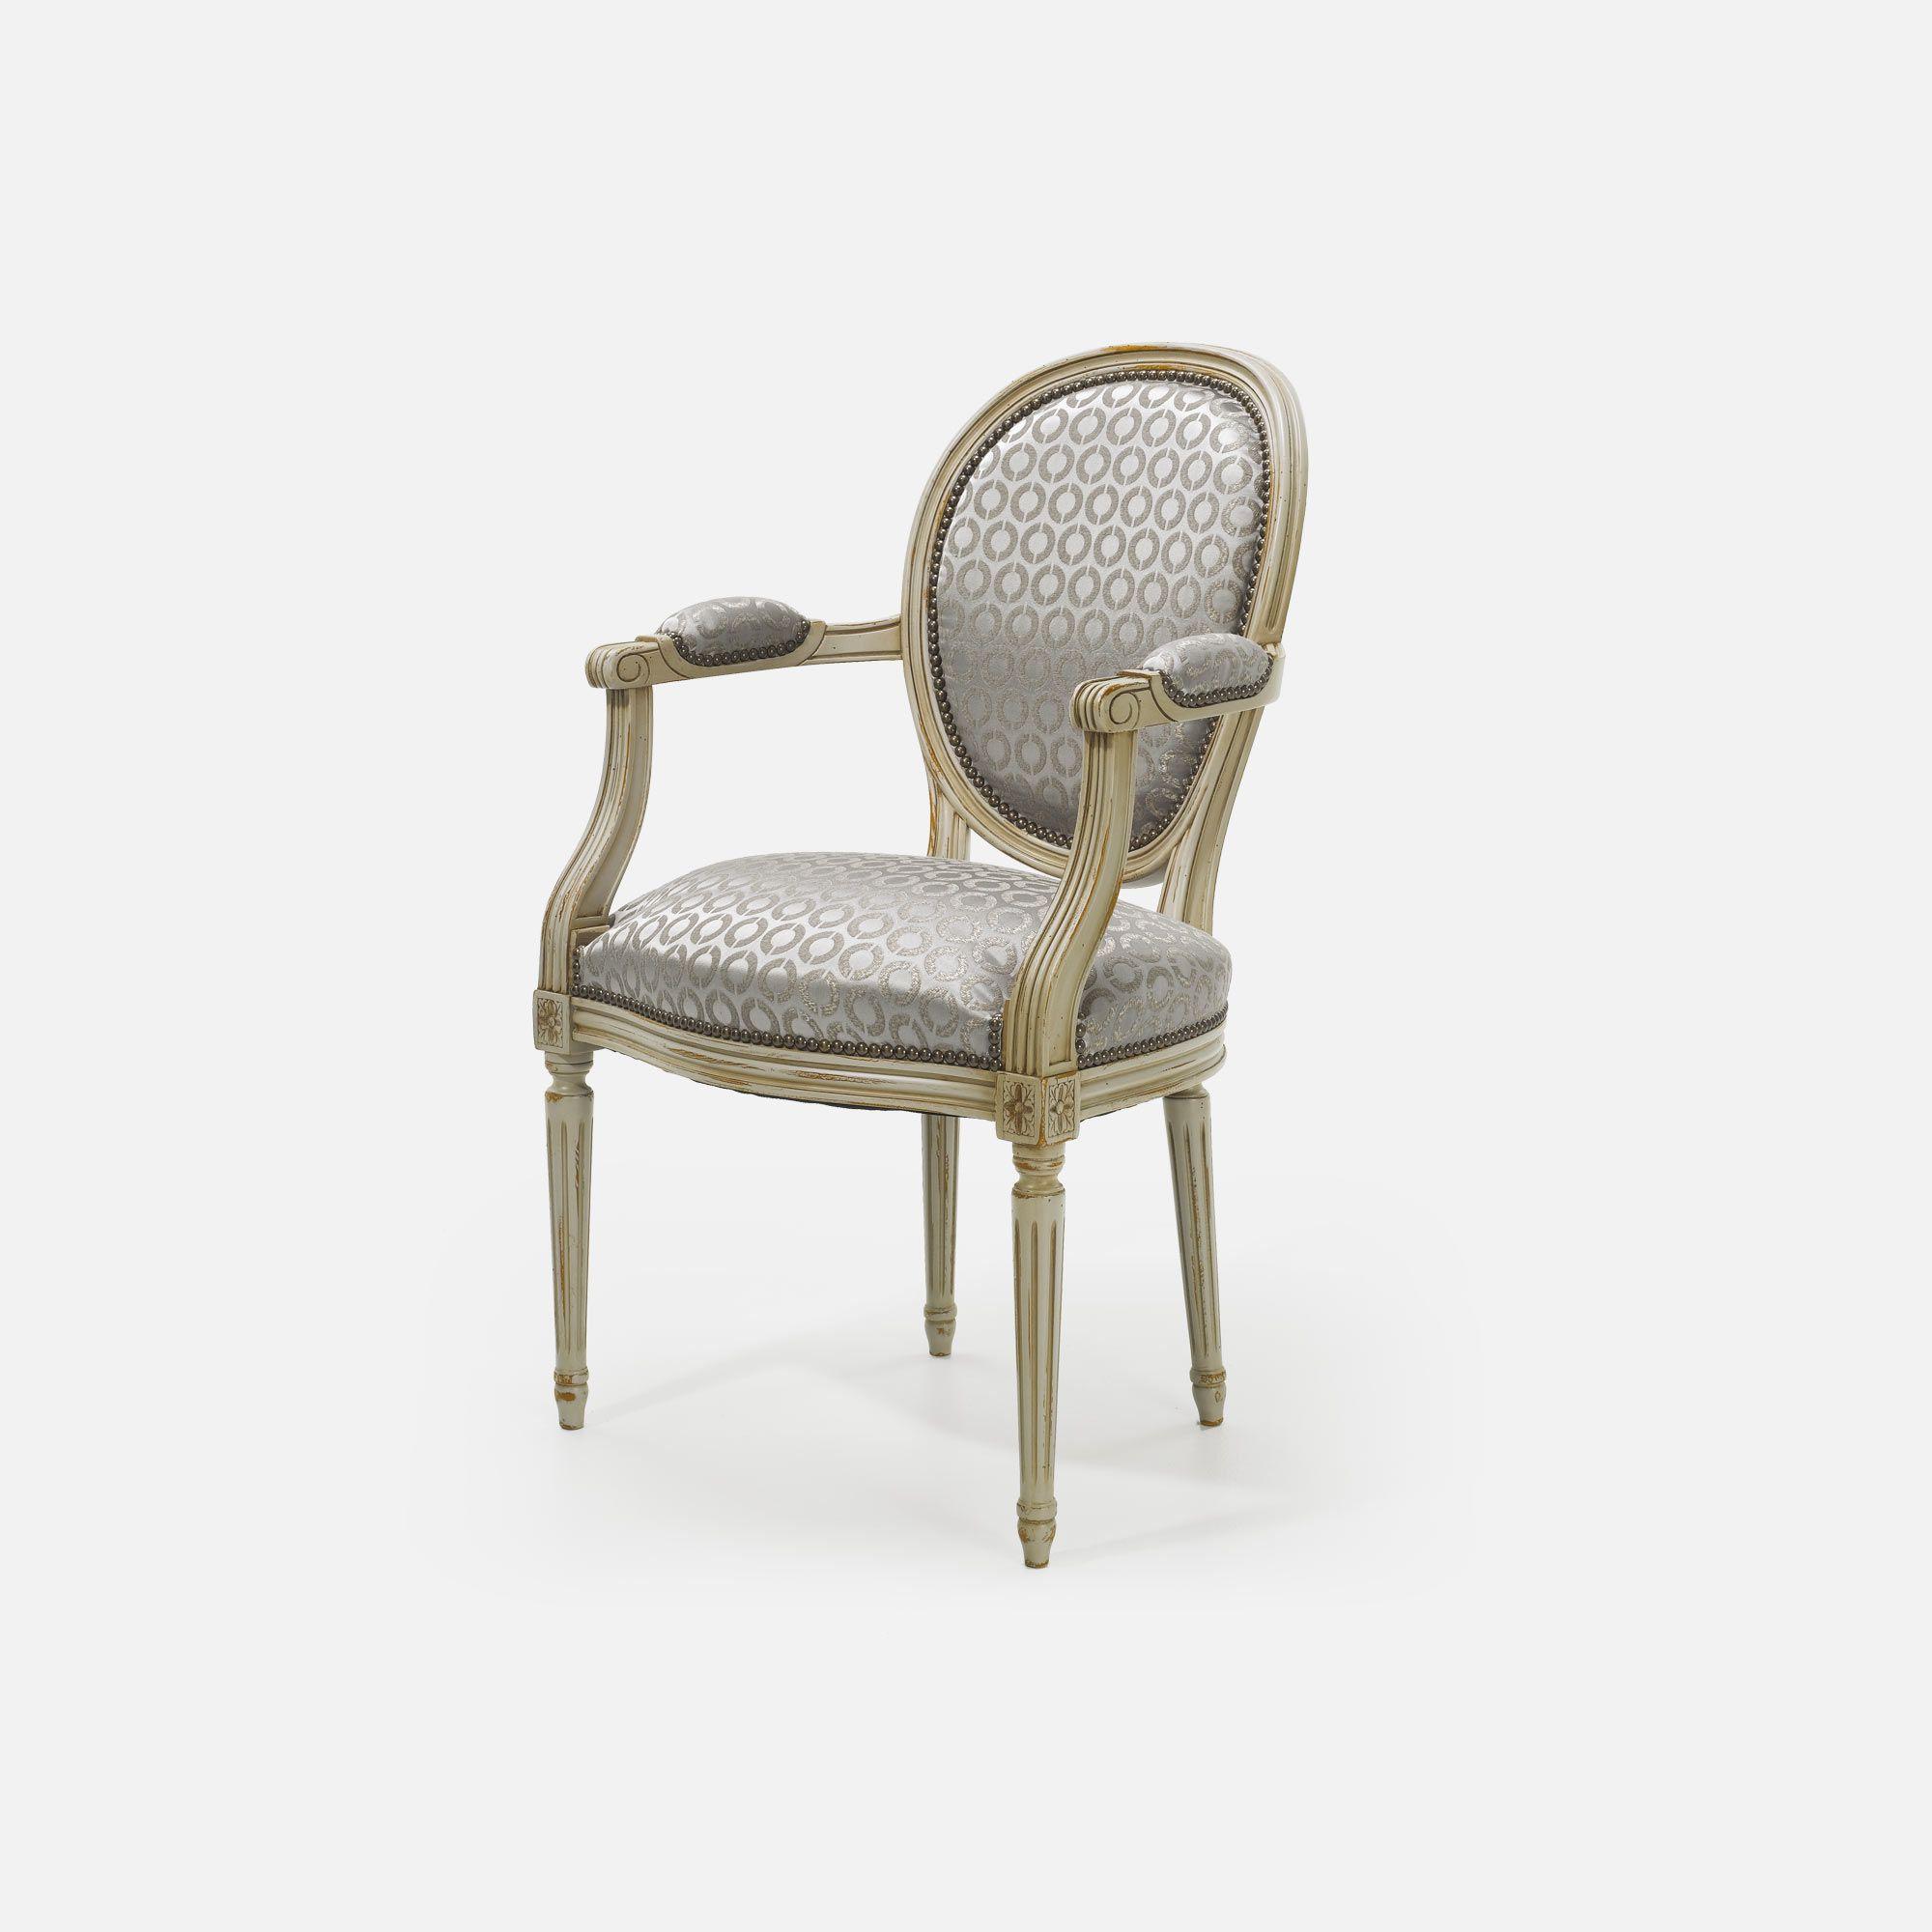 cool of chaise louis xvi table et chaises. Black Bedroom Furniture Sets. Home Design Ideas